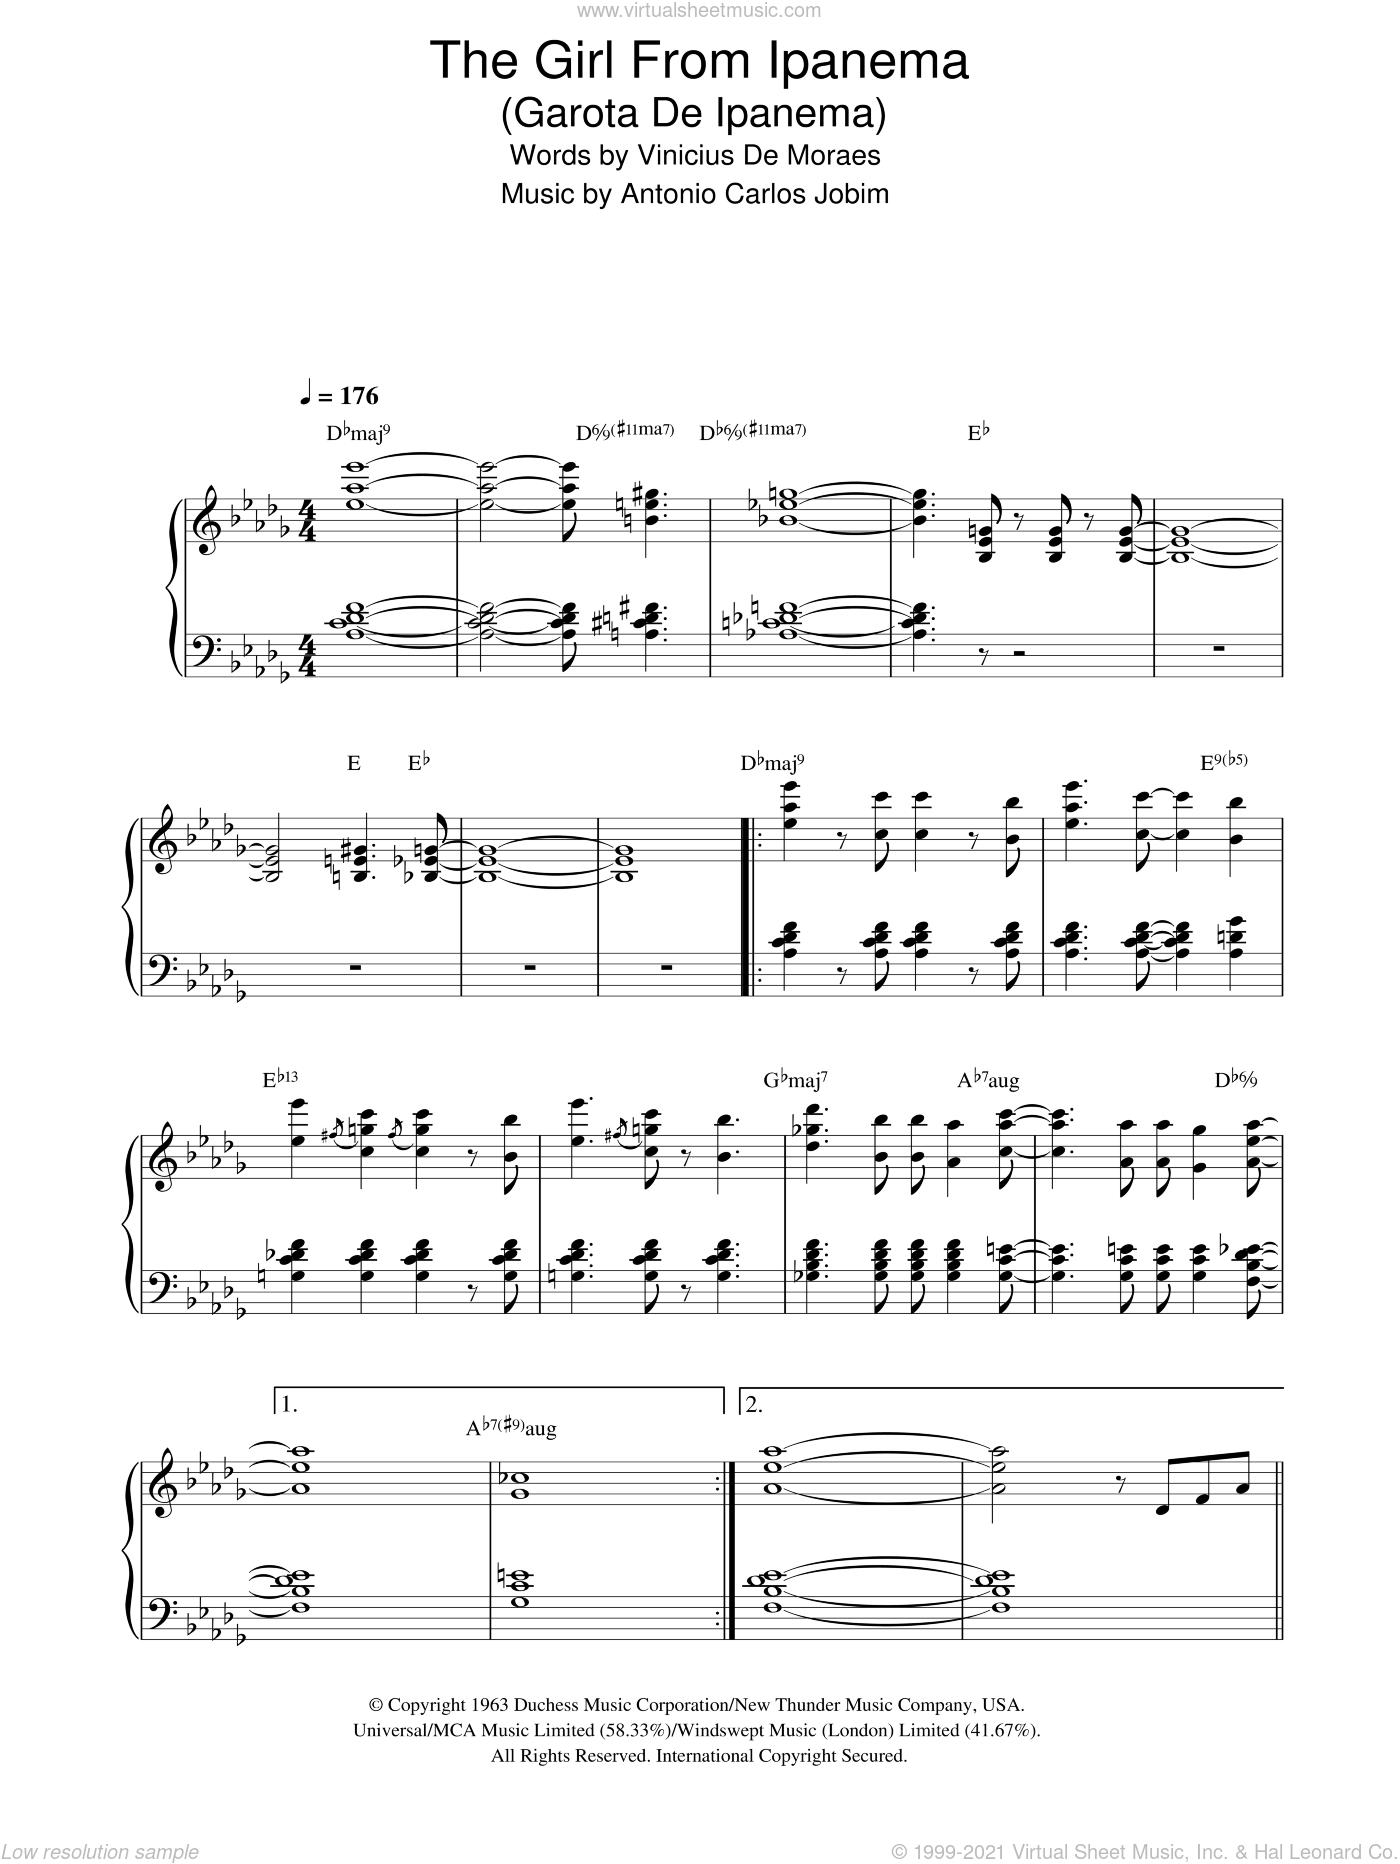 The Girl From Ipanema (Garota De Ipanema) sheet music for piano solo by Antonio Carlos Jobim and Vinicius de Moraes, intermediate skill level